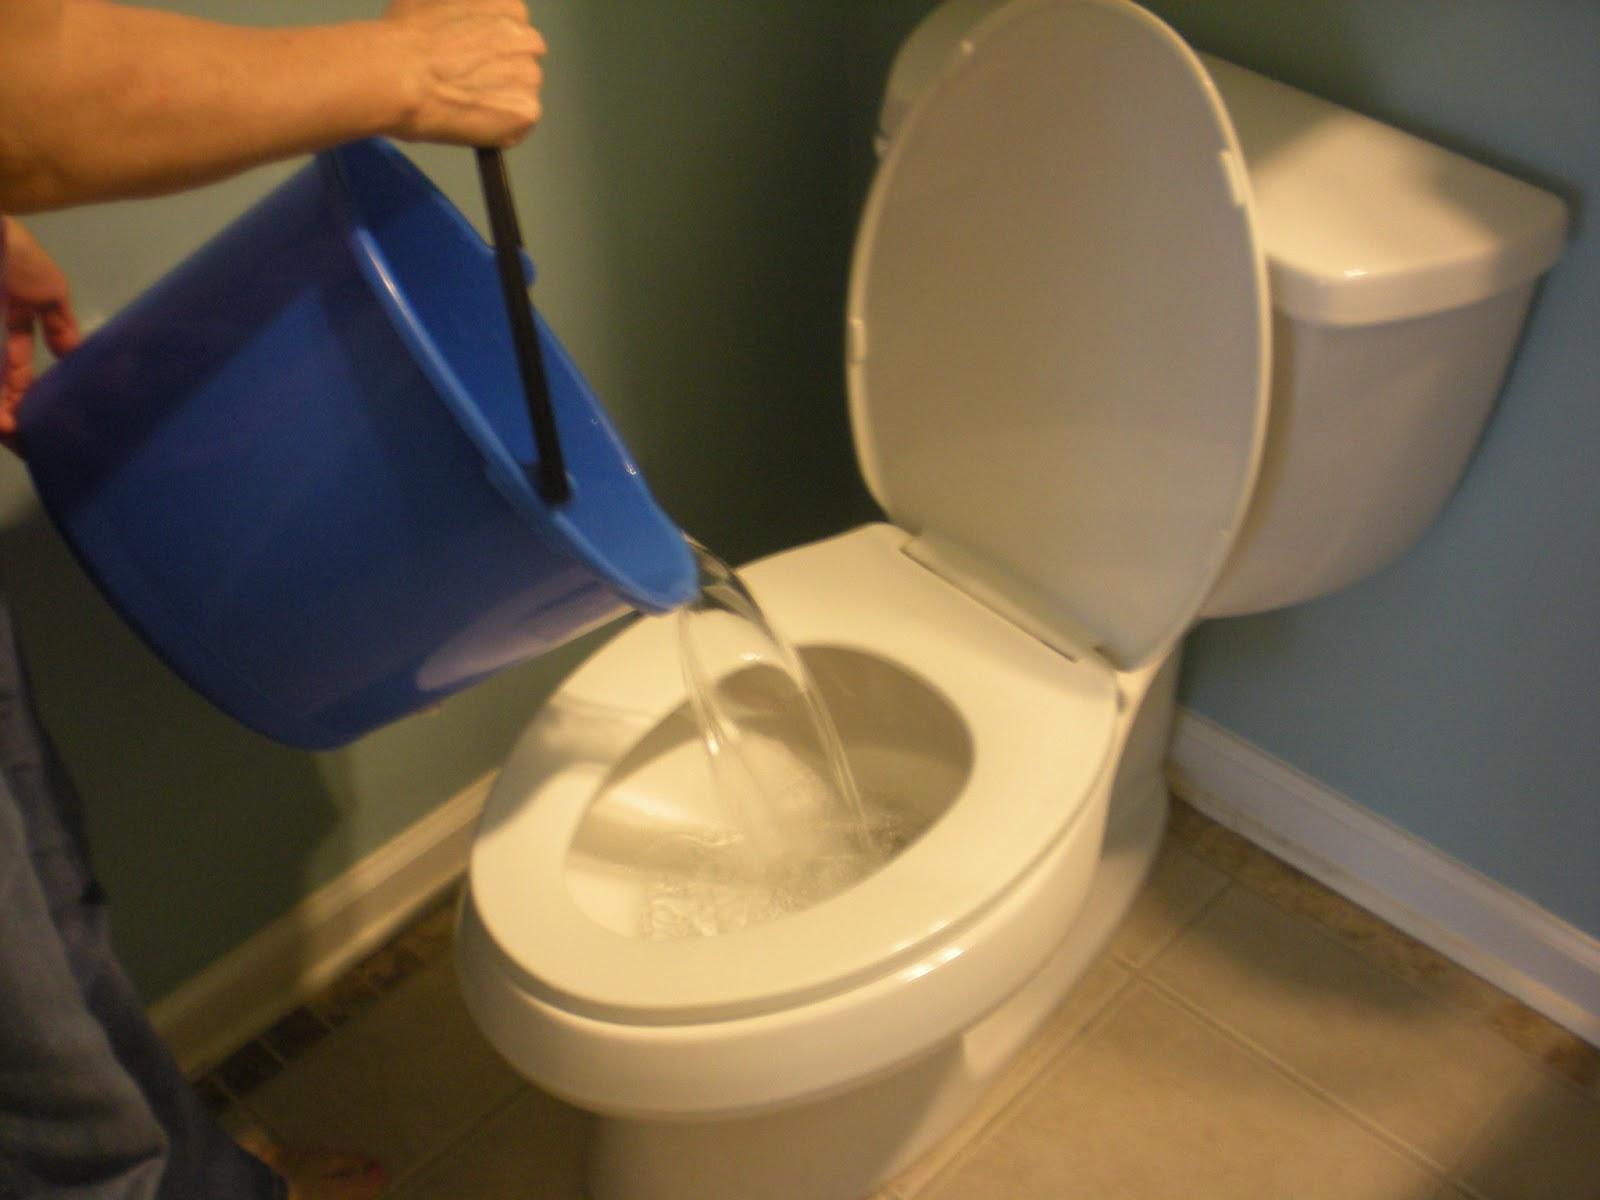 Gotta Wanna Needa Getta Prepared: Flushing a toilet using a bucket